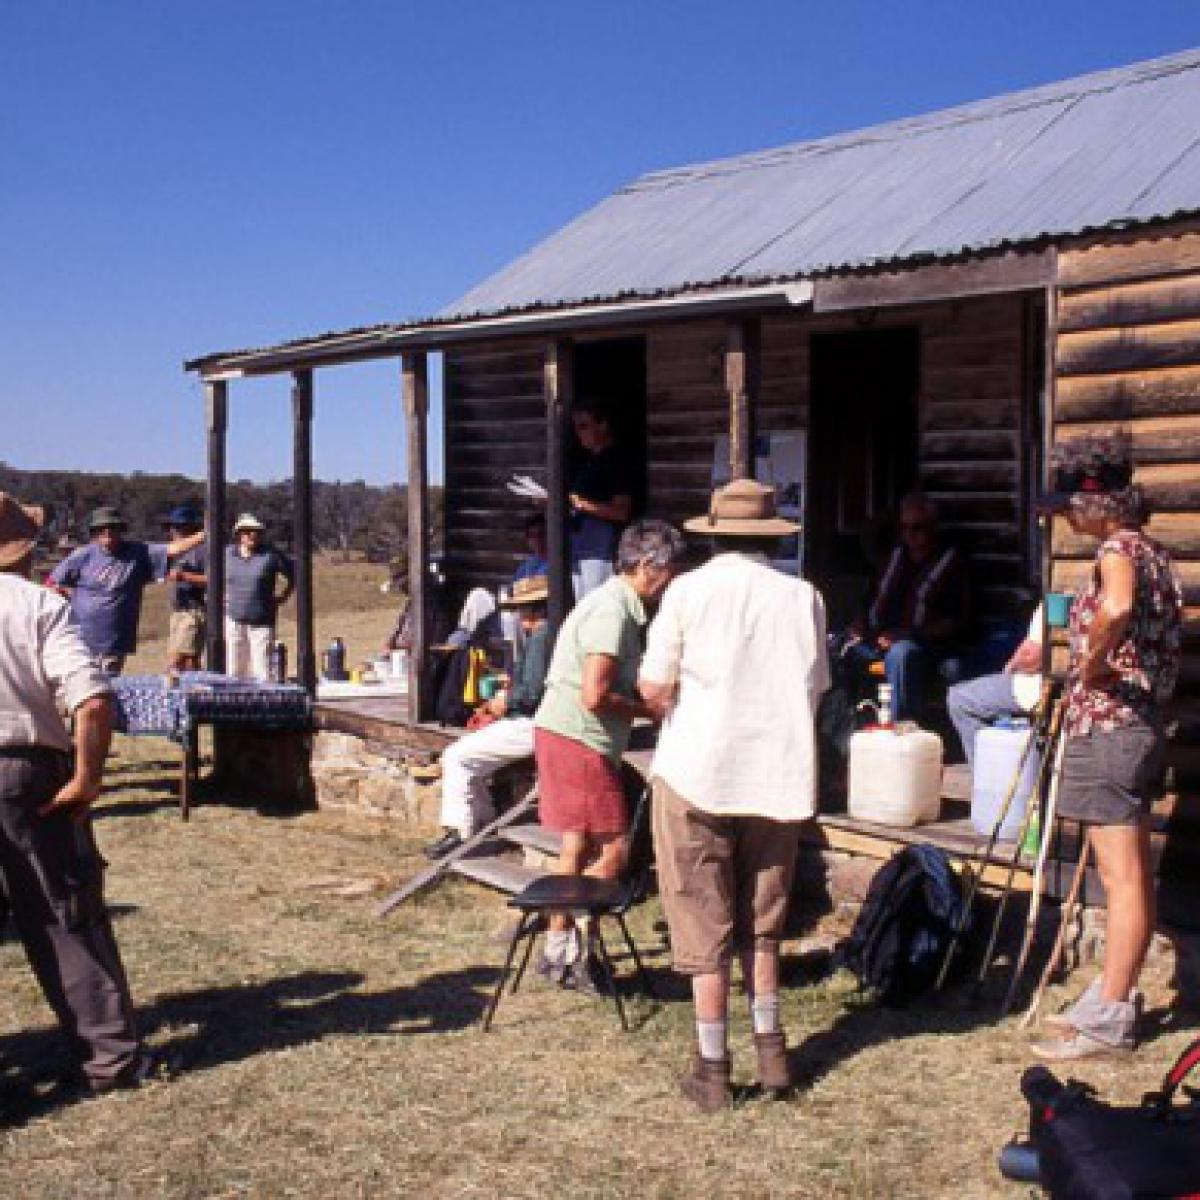 A combined NPA/KHA visit to Davey's Hut